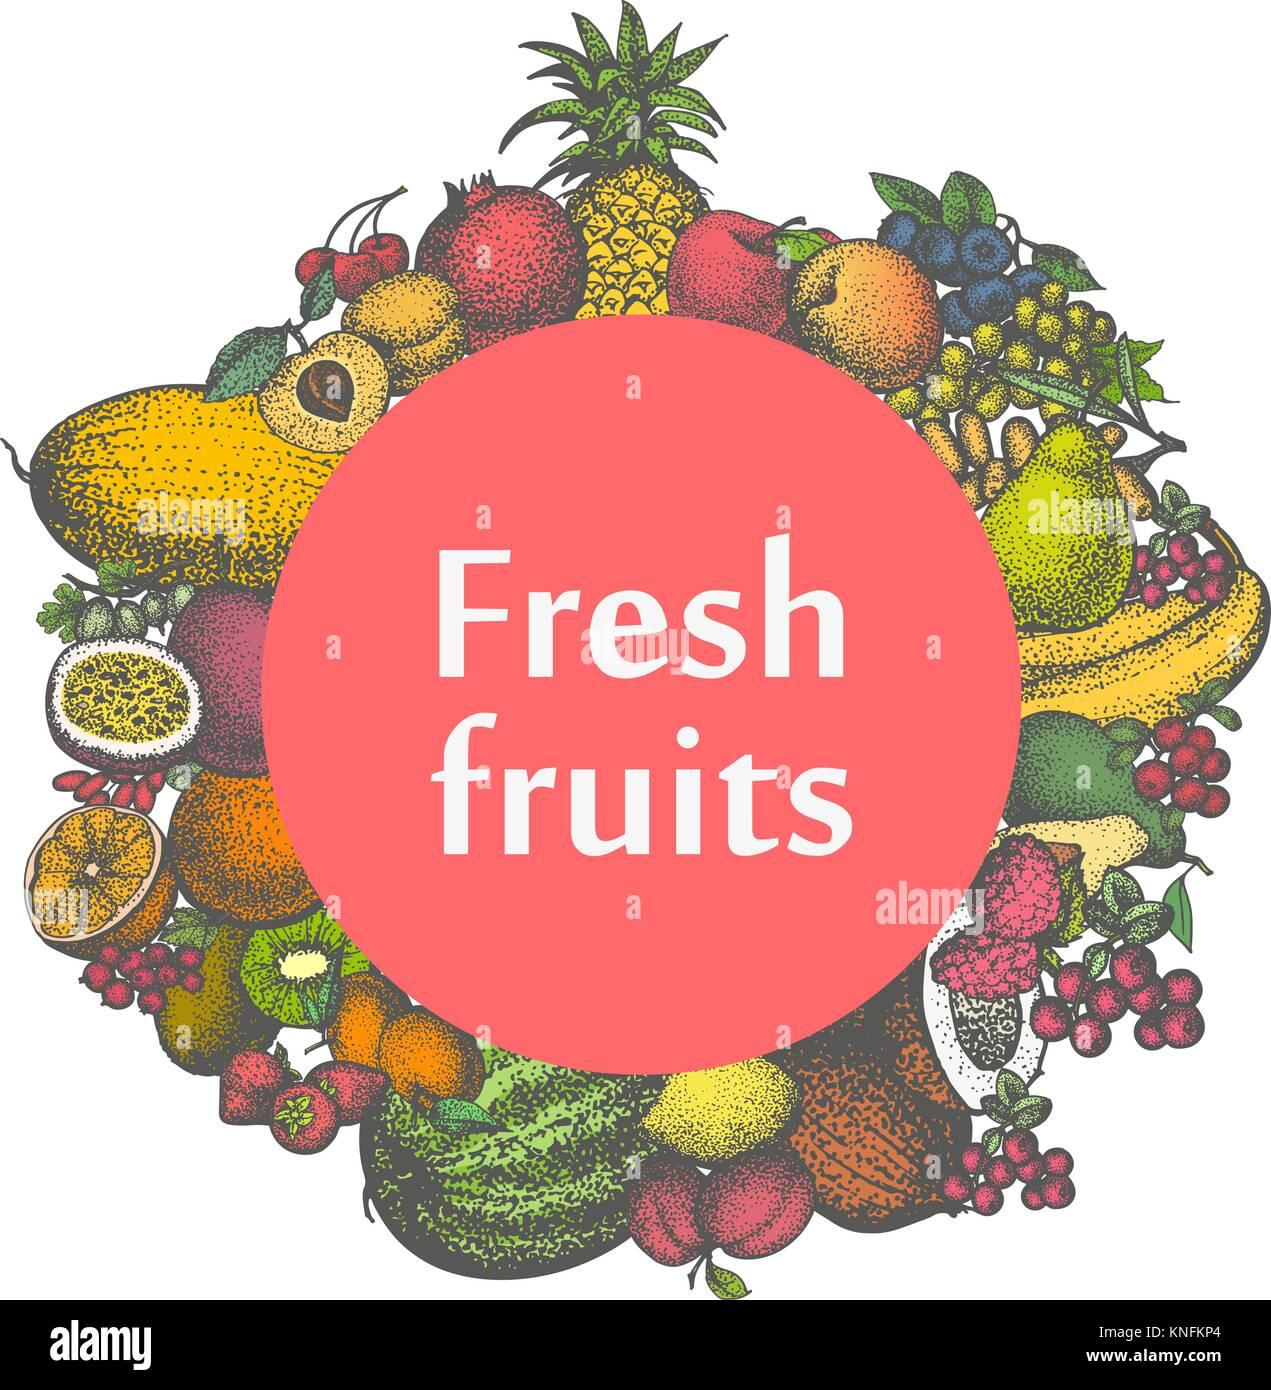 Vector mark sticker sign icon of fresh fruits - Stock Vector